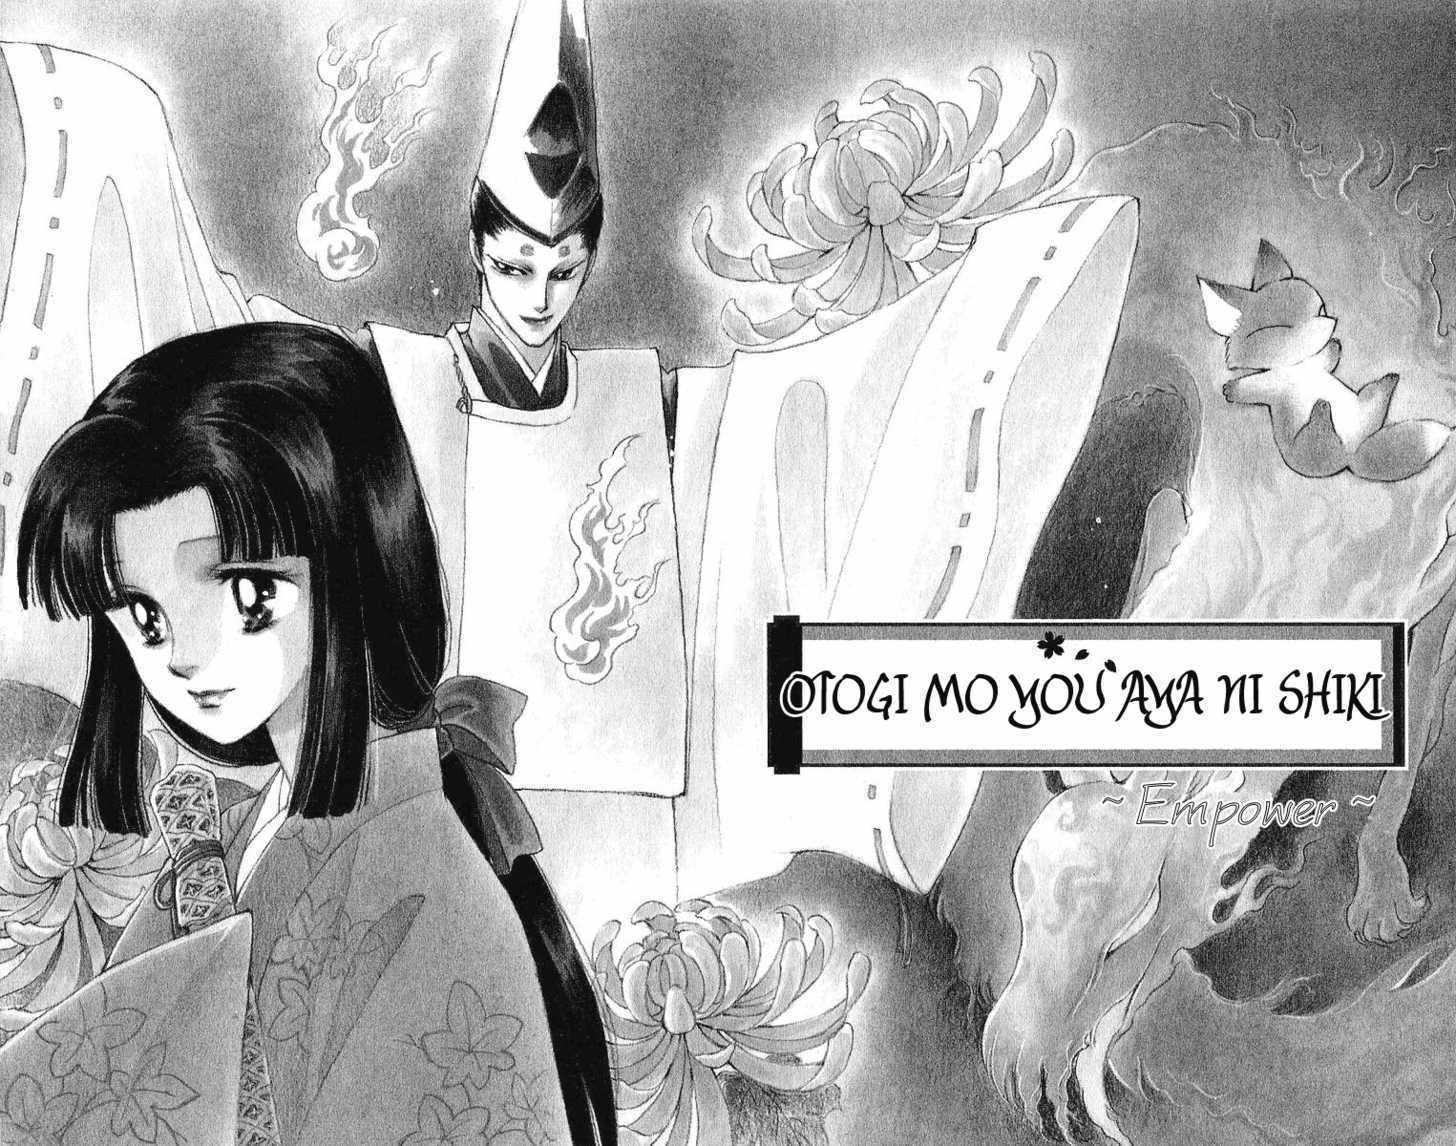 Otogi Moyou Ayanishiki 3 Page 1